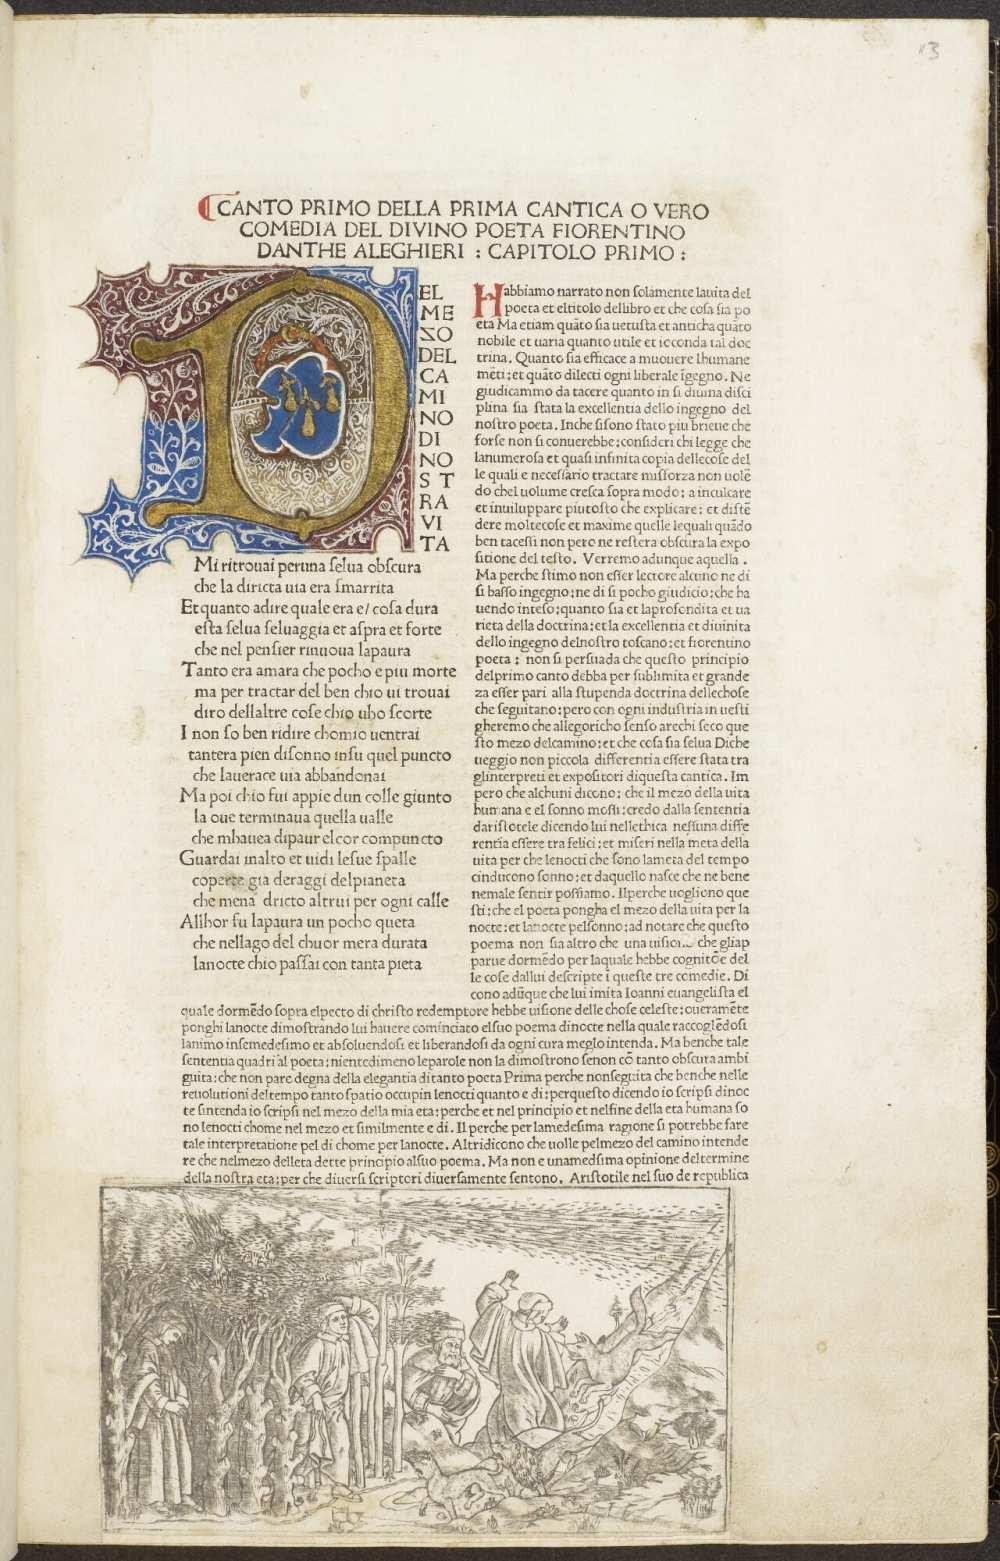 La Commedia (Comm. Cristophorus Landinus). (17280). A kép forrása: University of Manchester, Digital Collection. https://www.digitalcollections.manchester.ac.uk/view/PR-INCU-17280/33